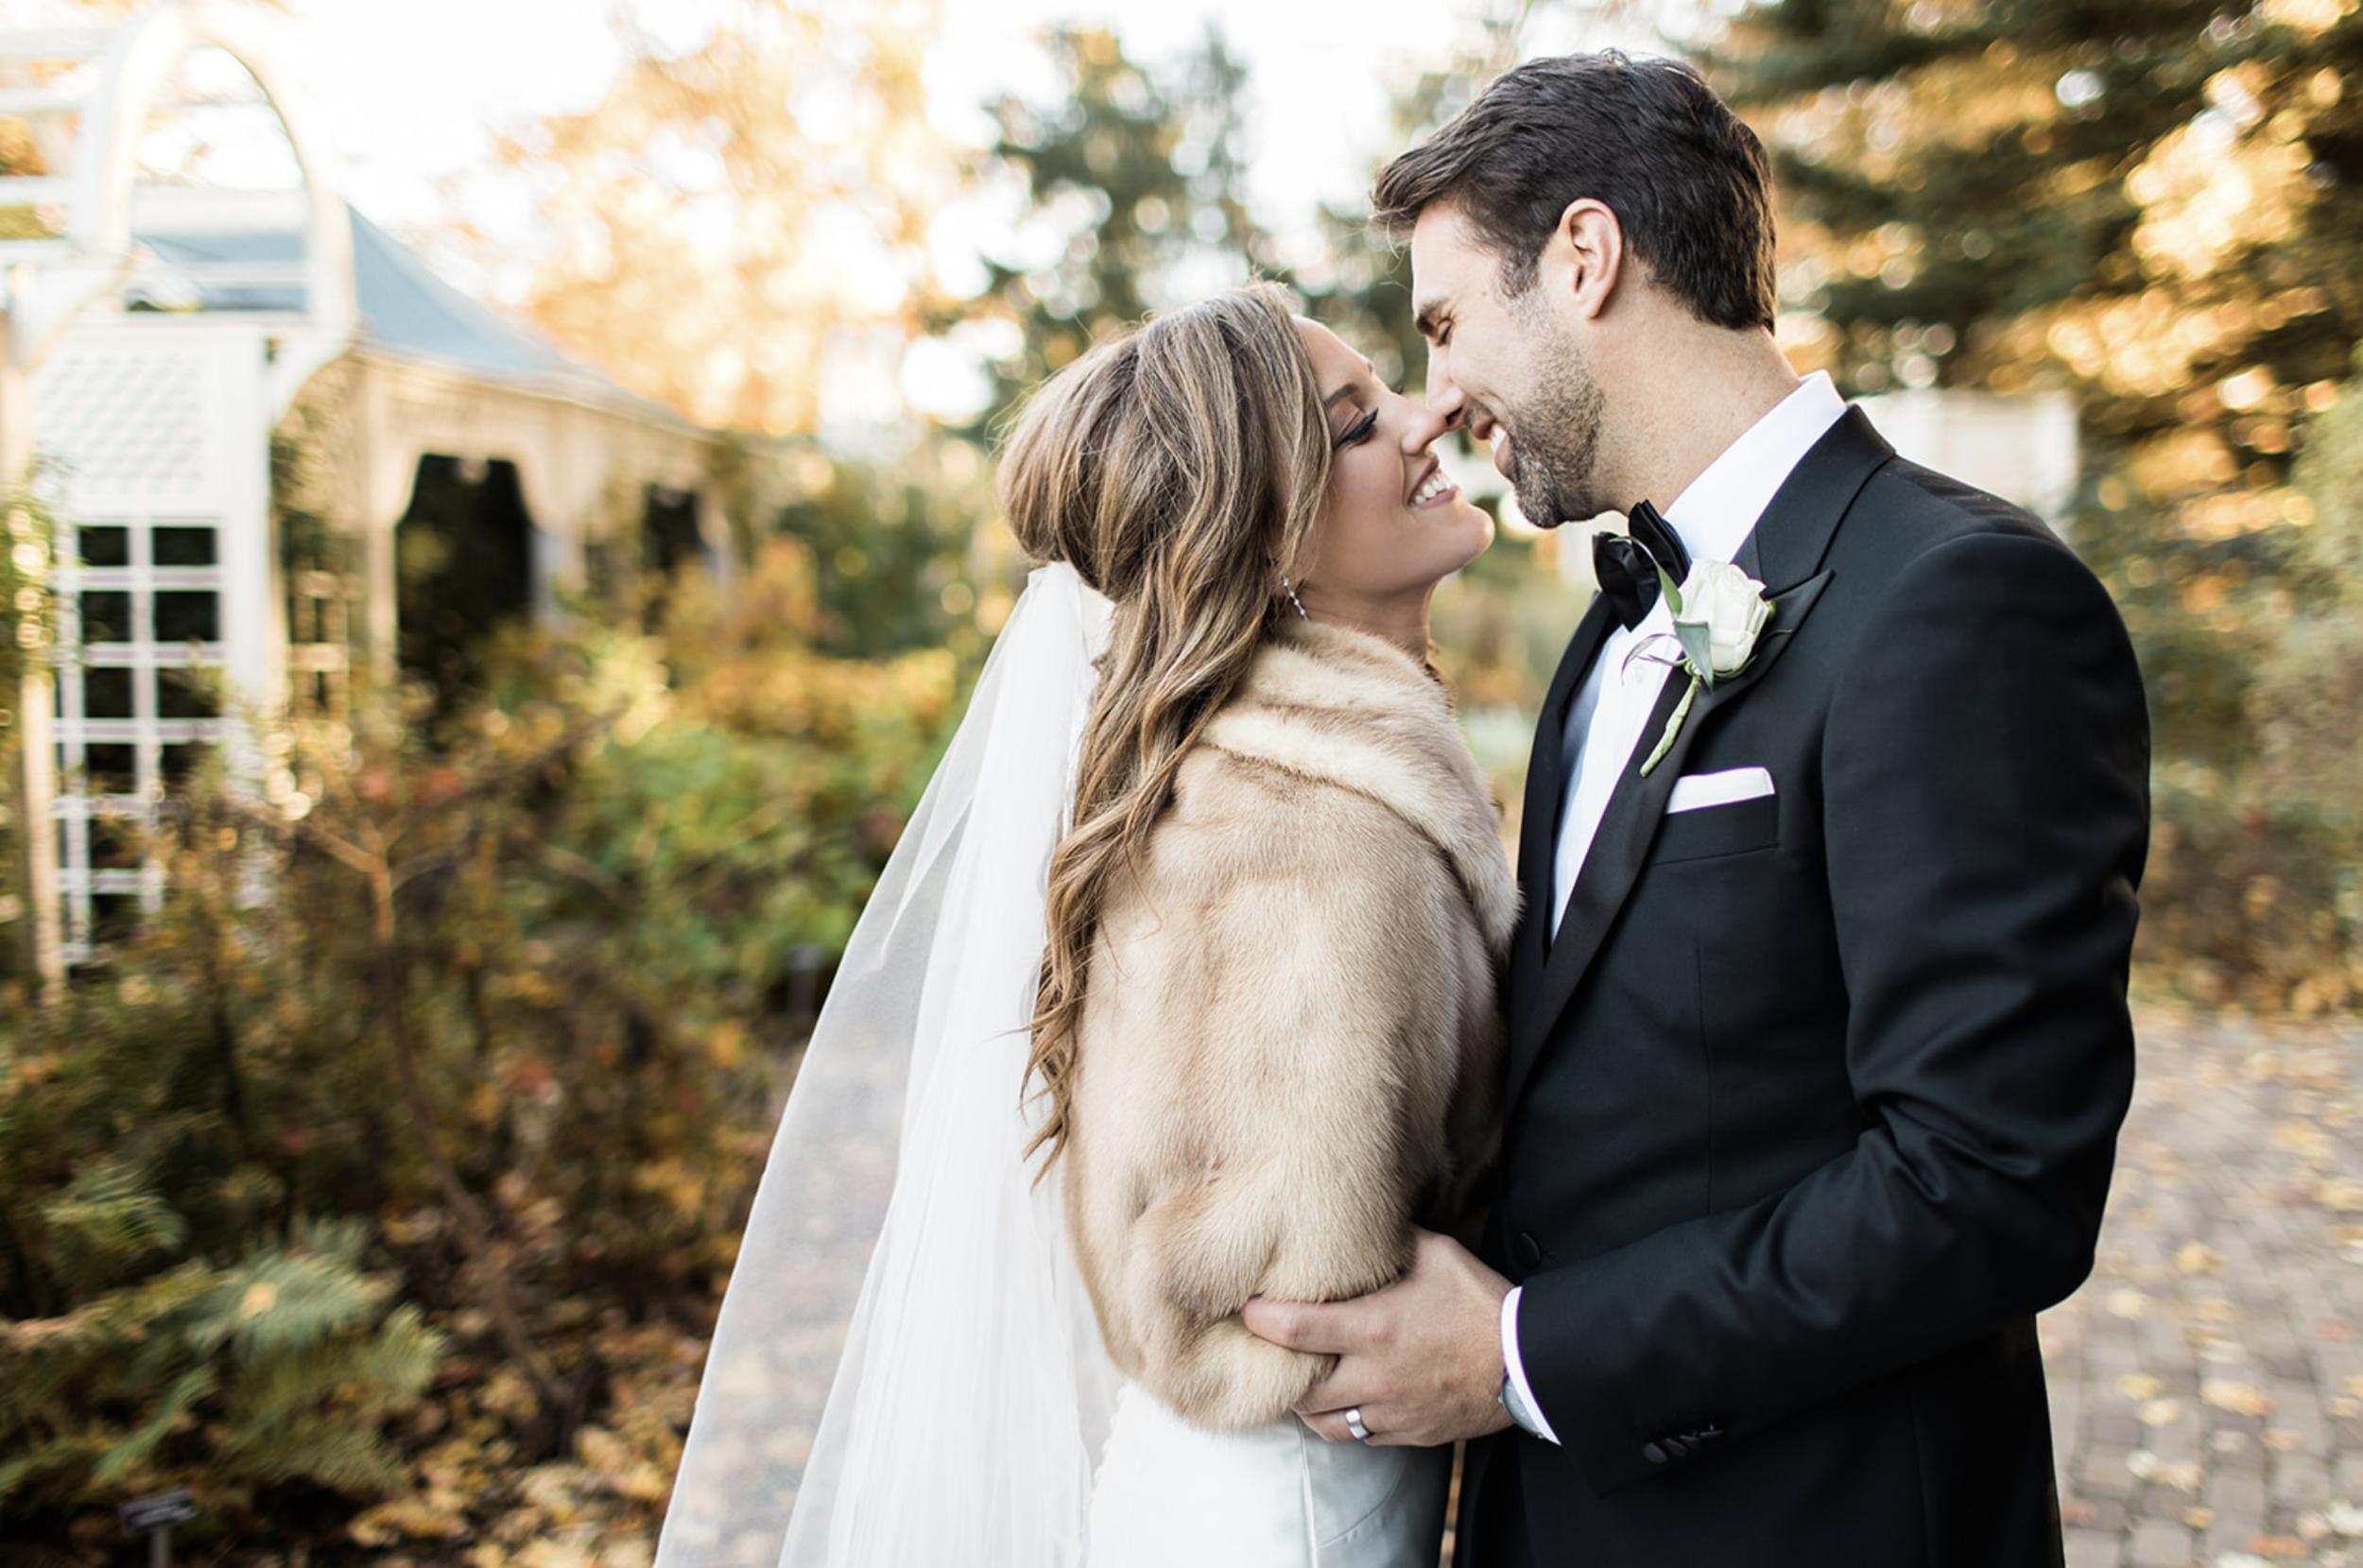 Lindsey-Ramdin-Wedding-Photographer-Cleveland-Pittsburgh-Destination-Elopement-02-11 at 12.01.40 PM.png